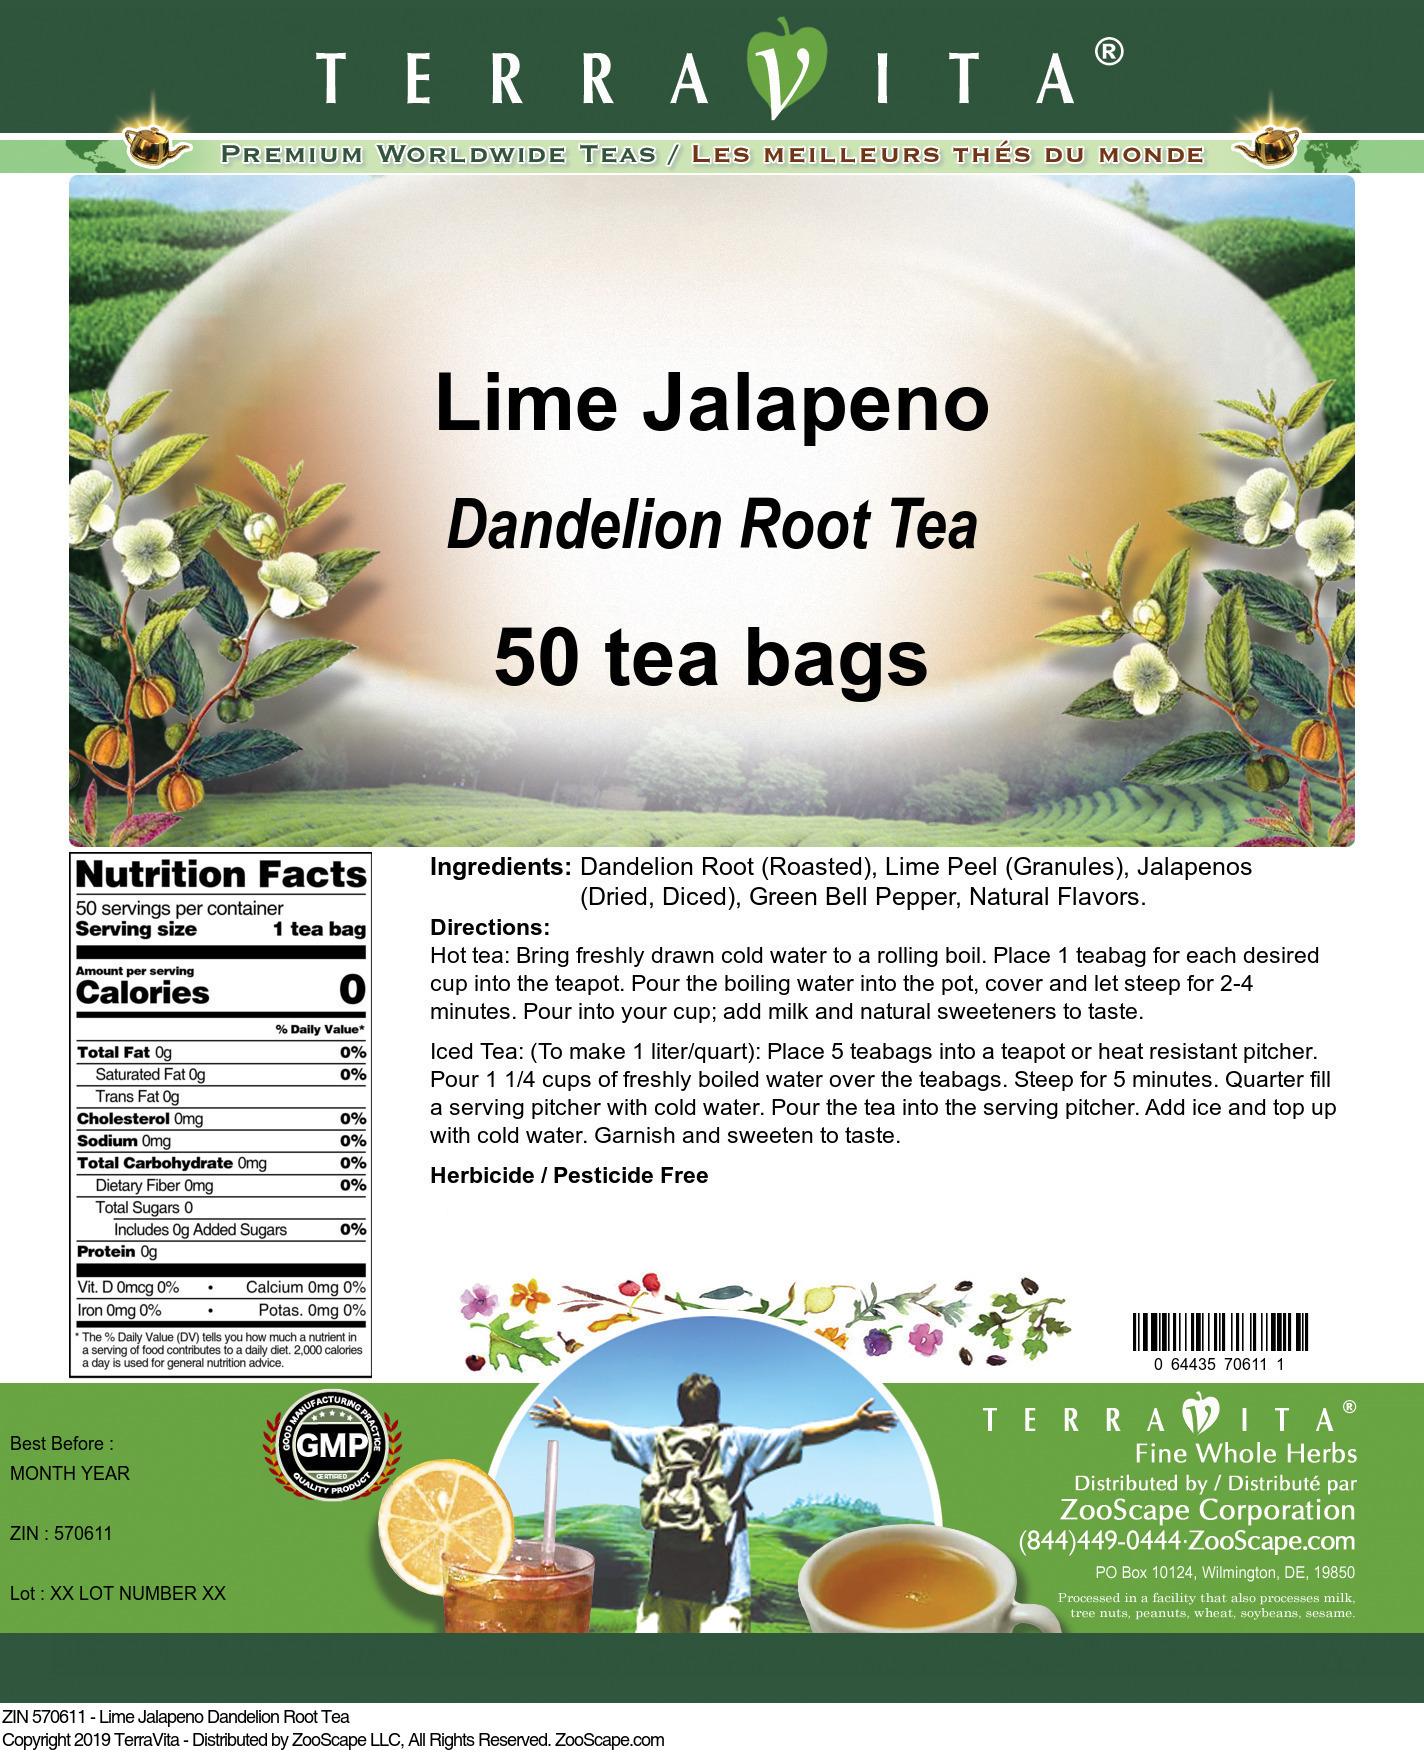 Lime Jalapeno Dandelion Root